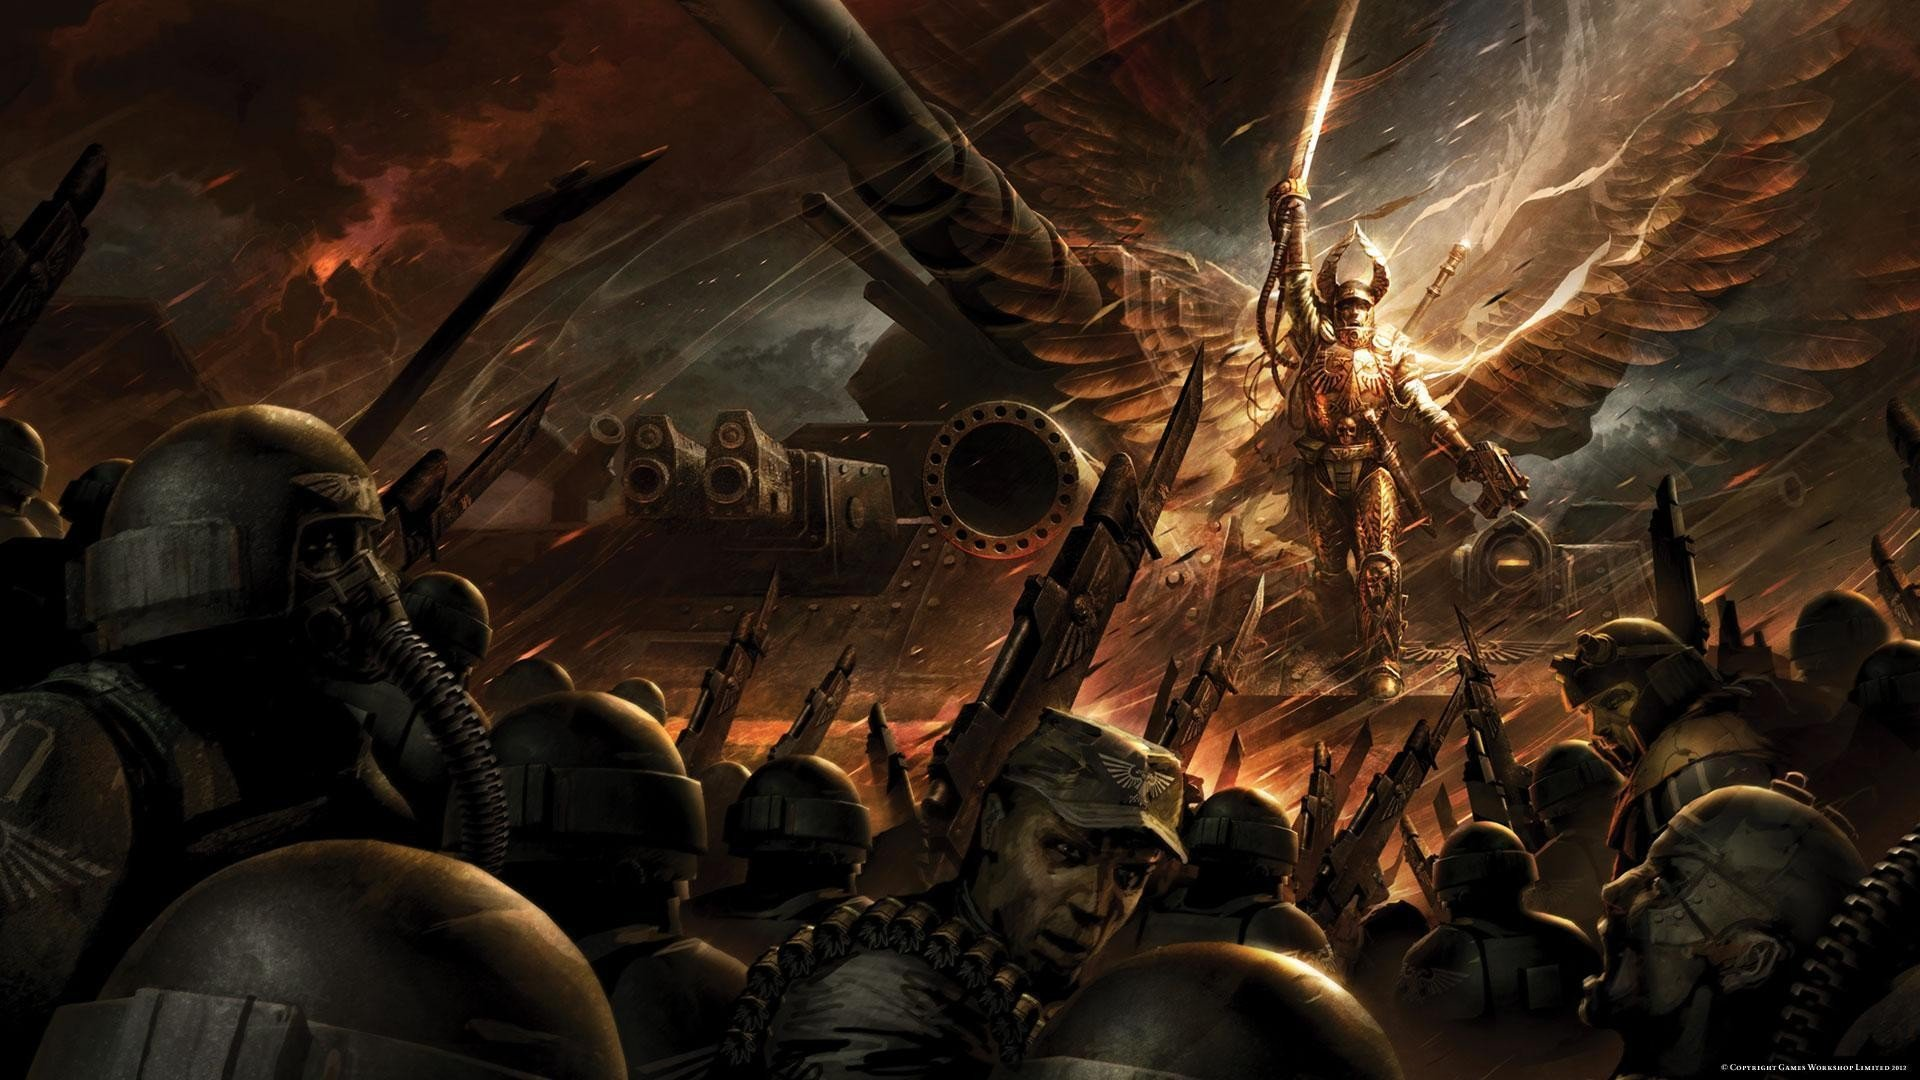 Warhammer 40k death company wallpaper - Imperial Guard Warhammer 40k Blood Angel Swords Angel